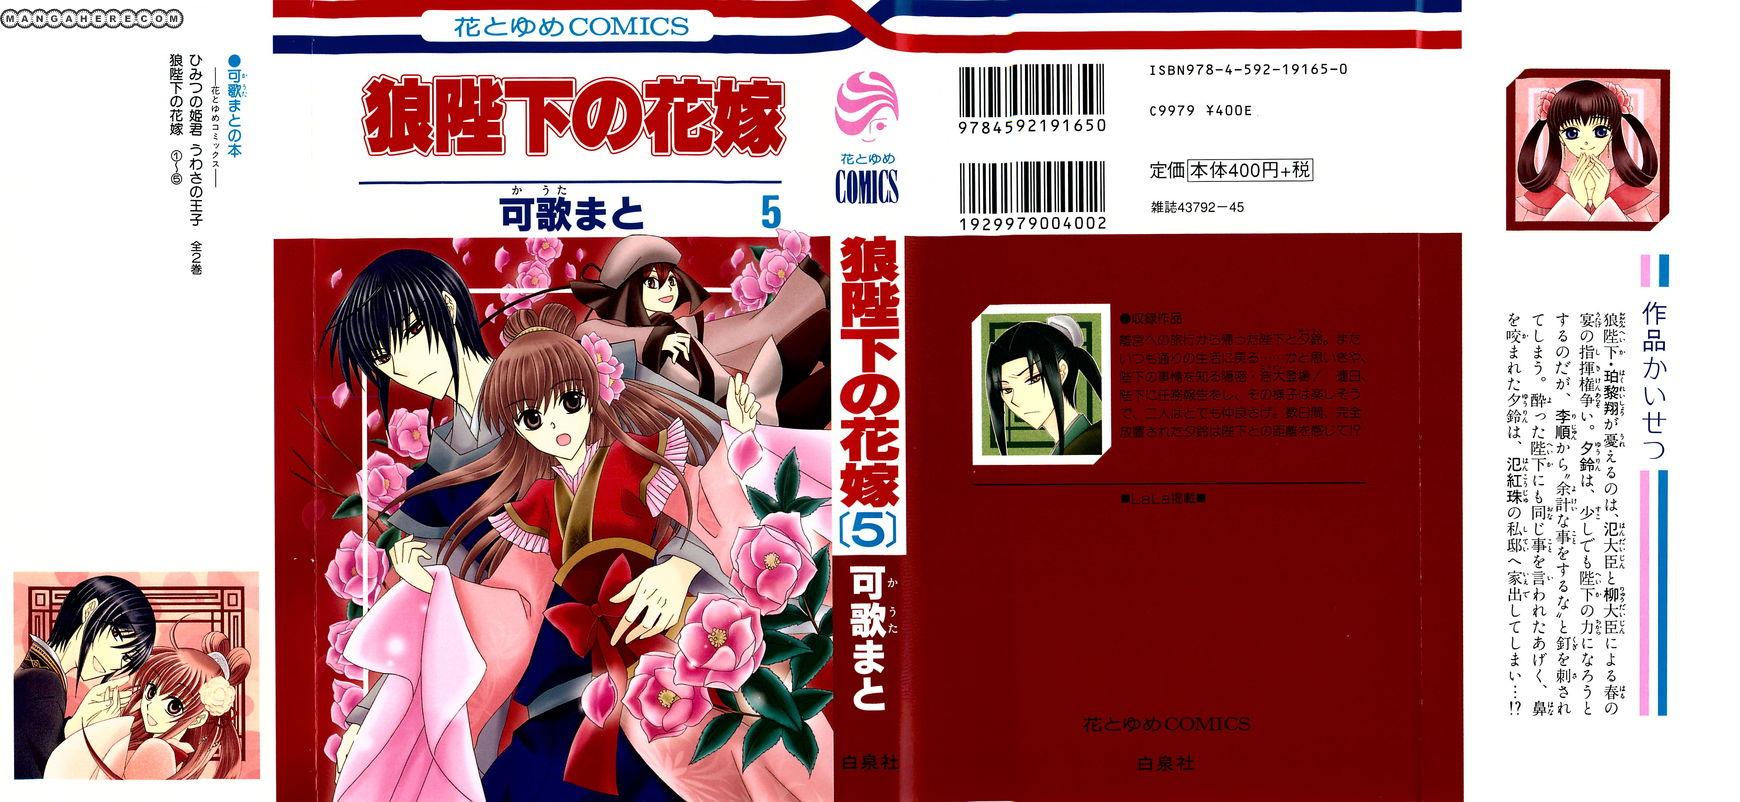 Ookami-heika no Hanayome 19 Page 2